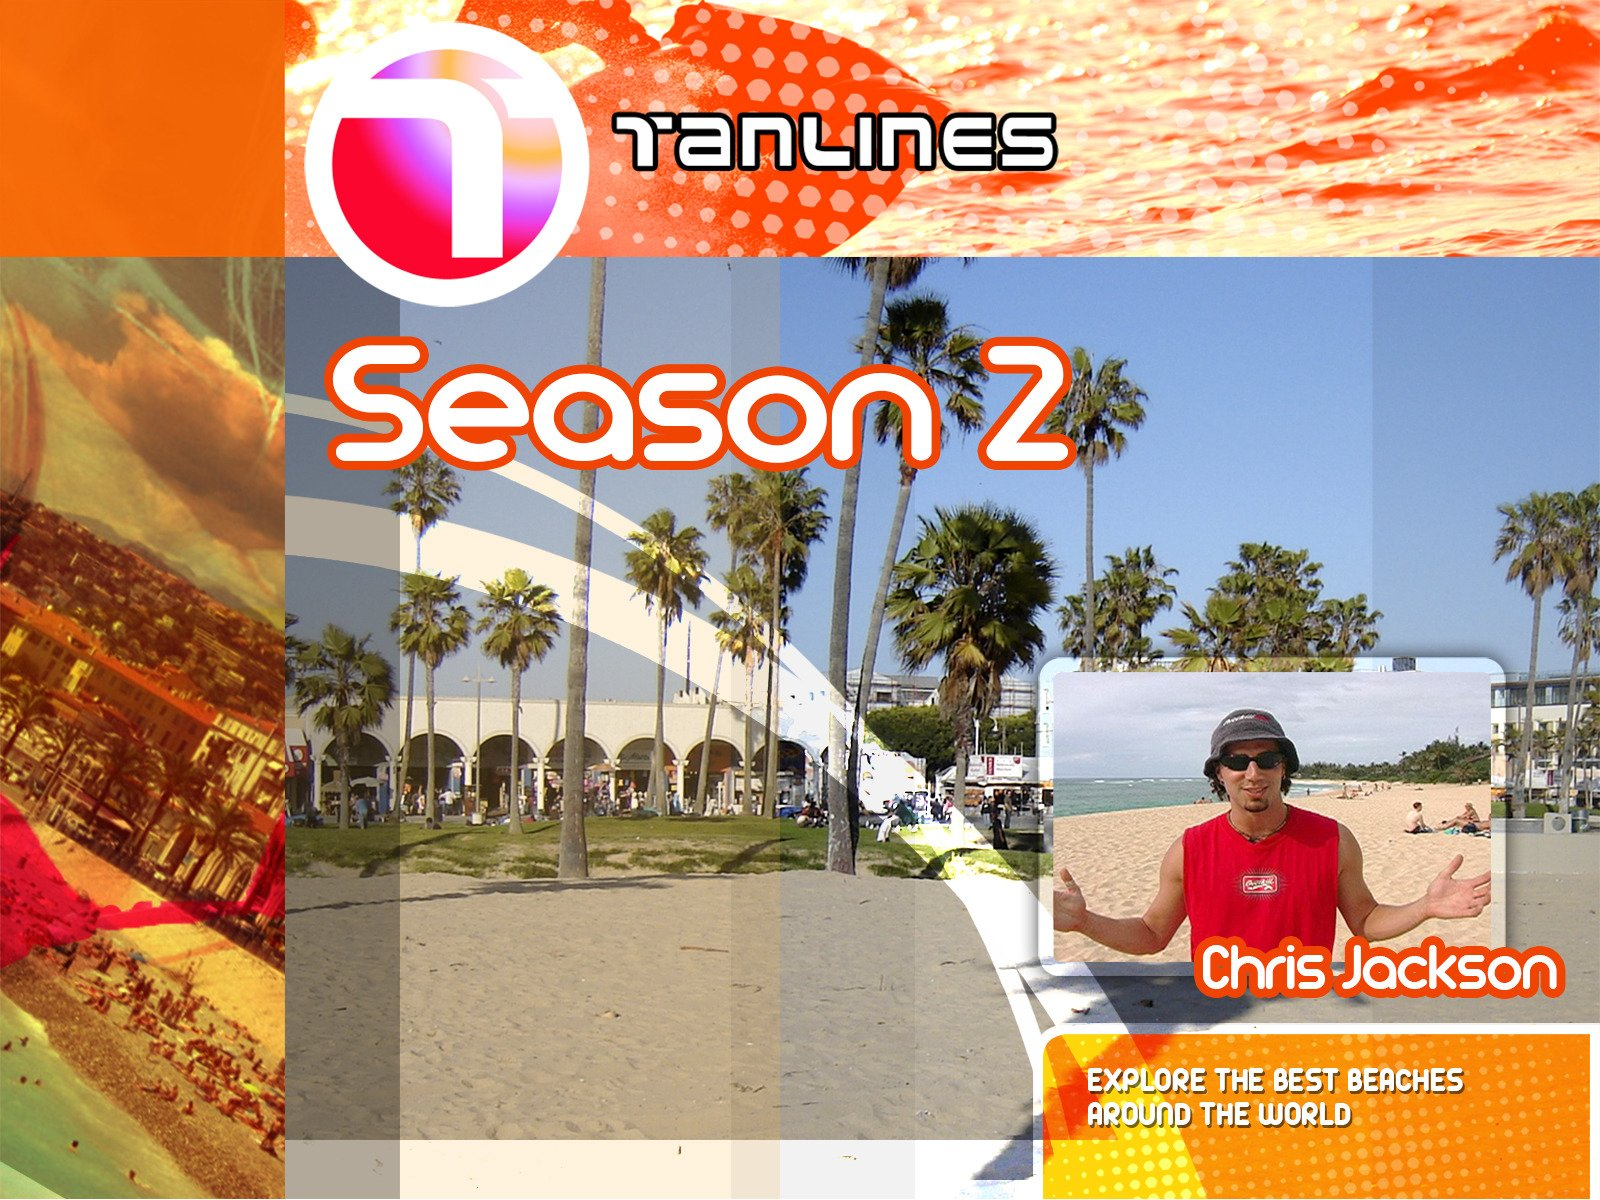 Tanlines - Season 2